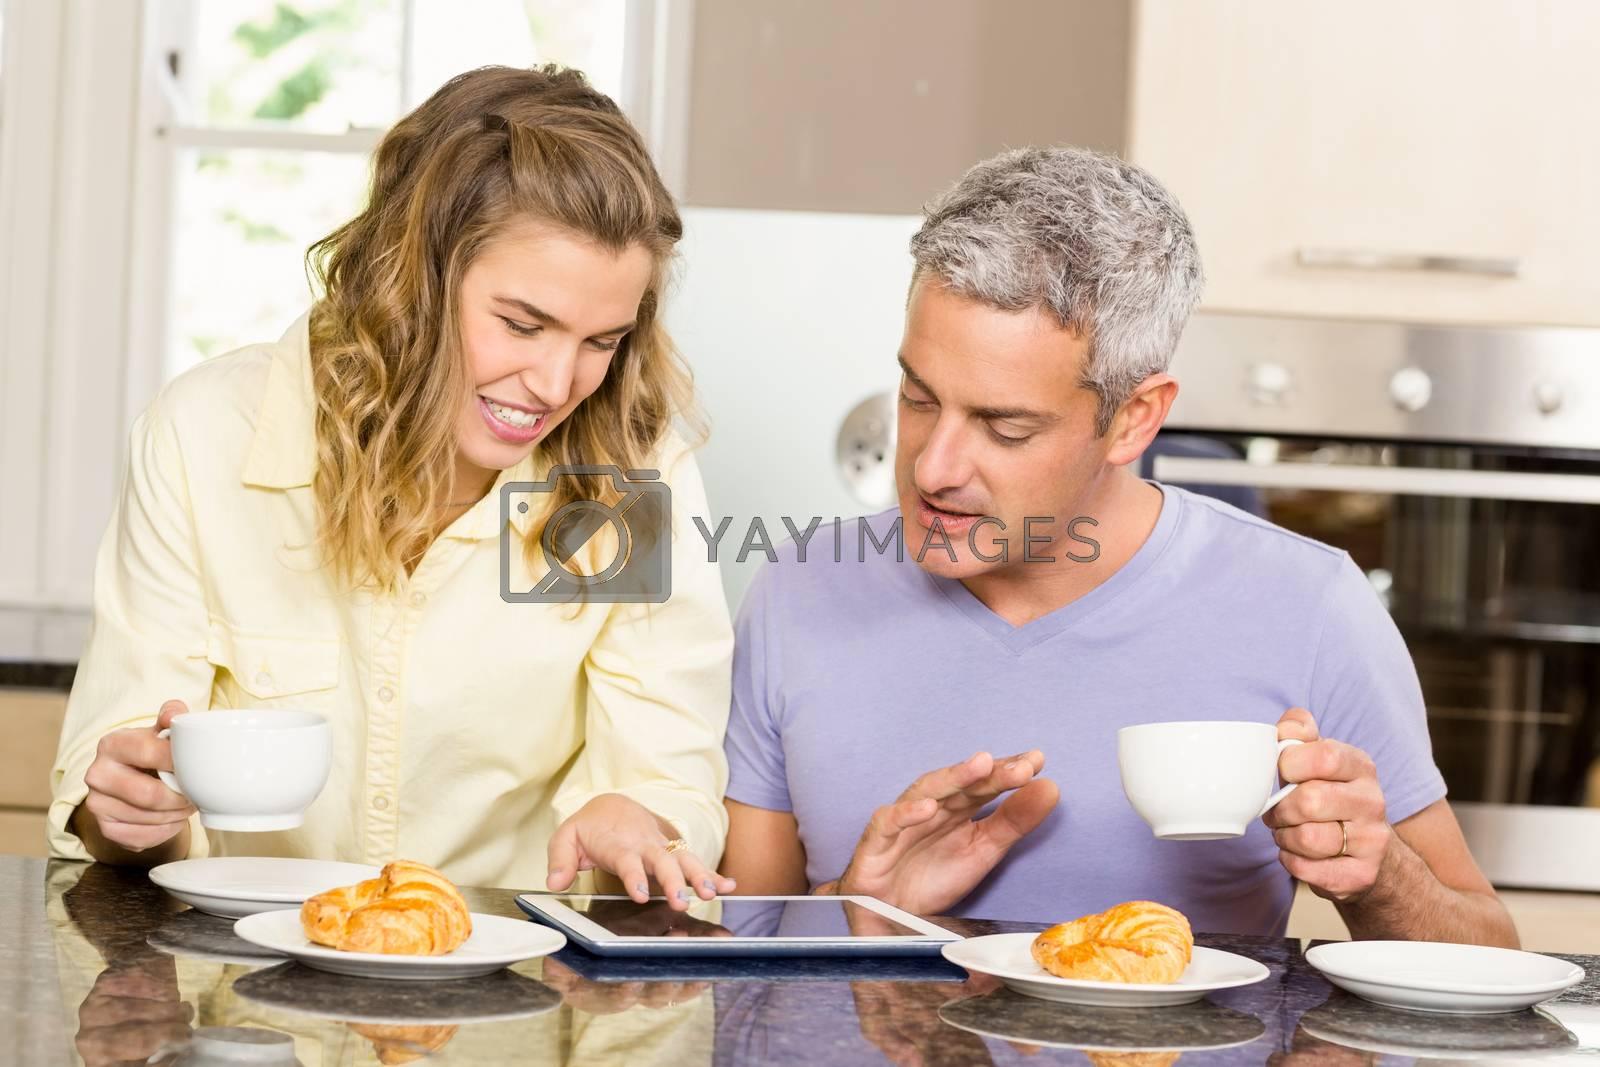 Happy couple using tablet and having breakfast by Wavebreakmedia